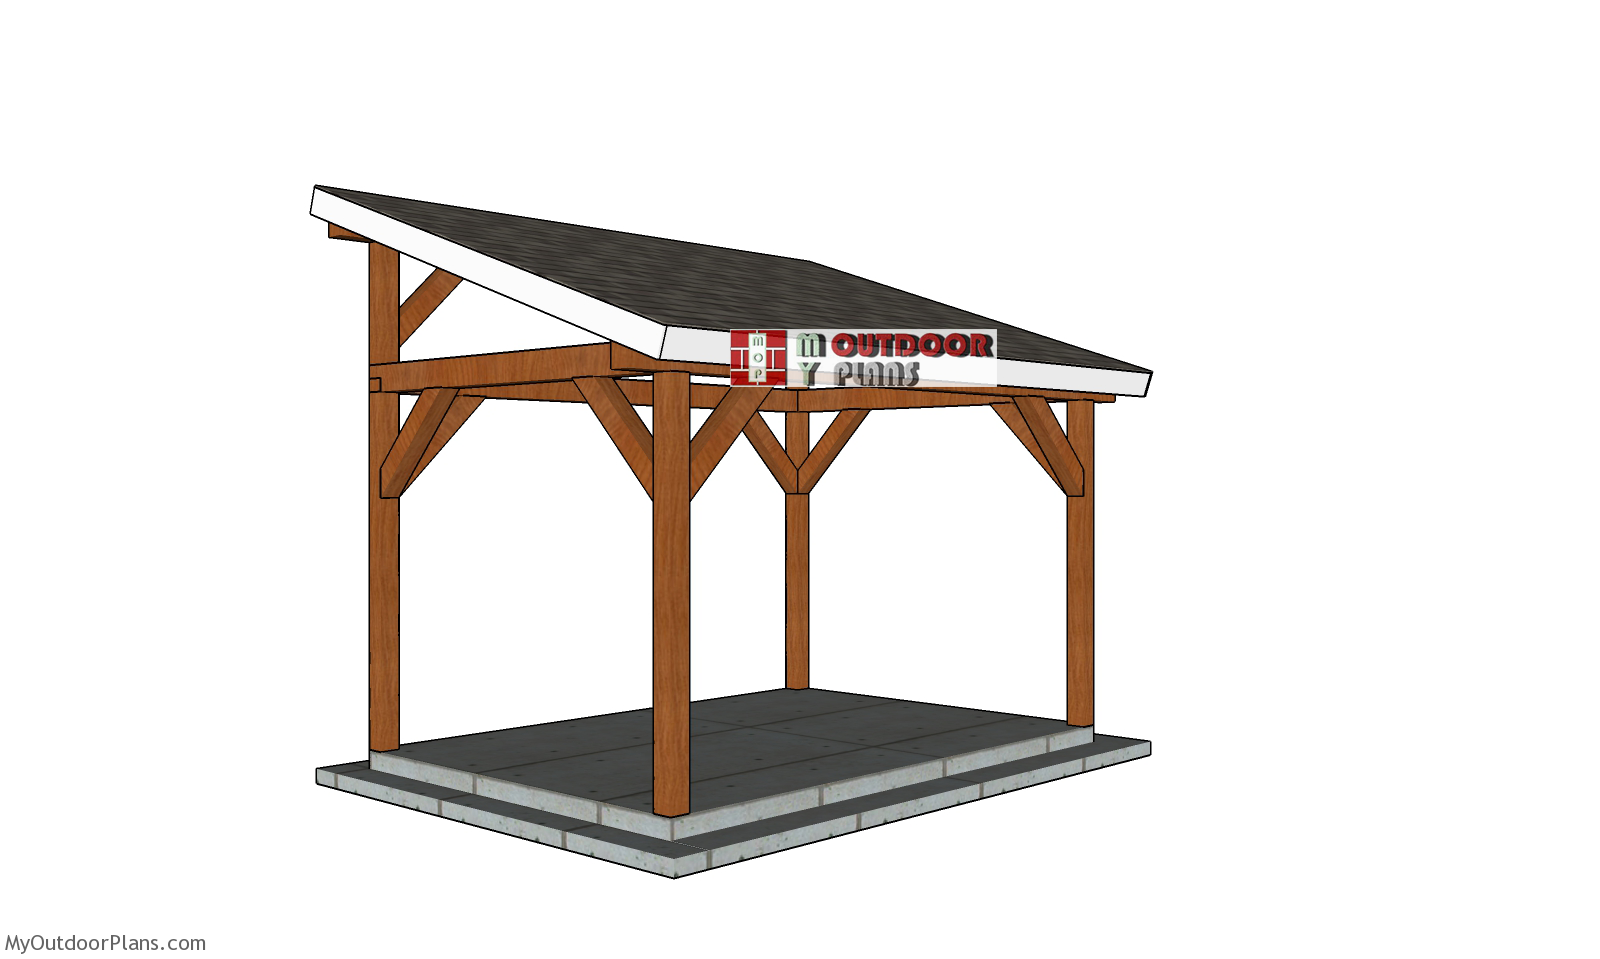 10x14 Lean to Pavilion - Free DIY Plans